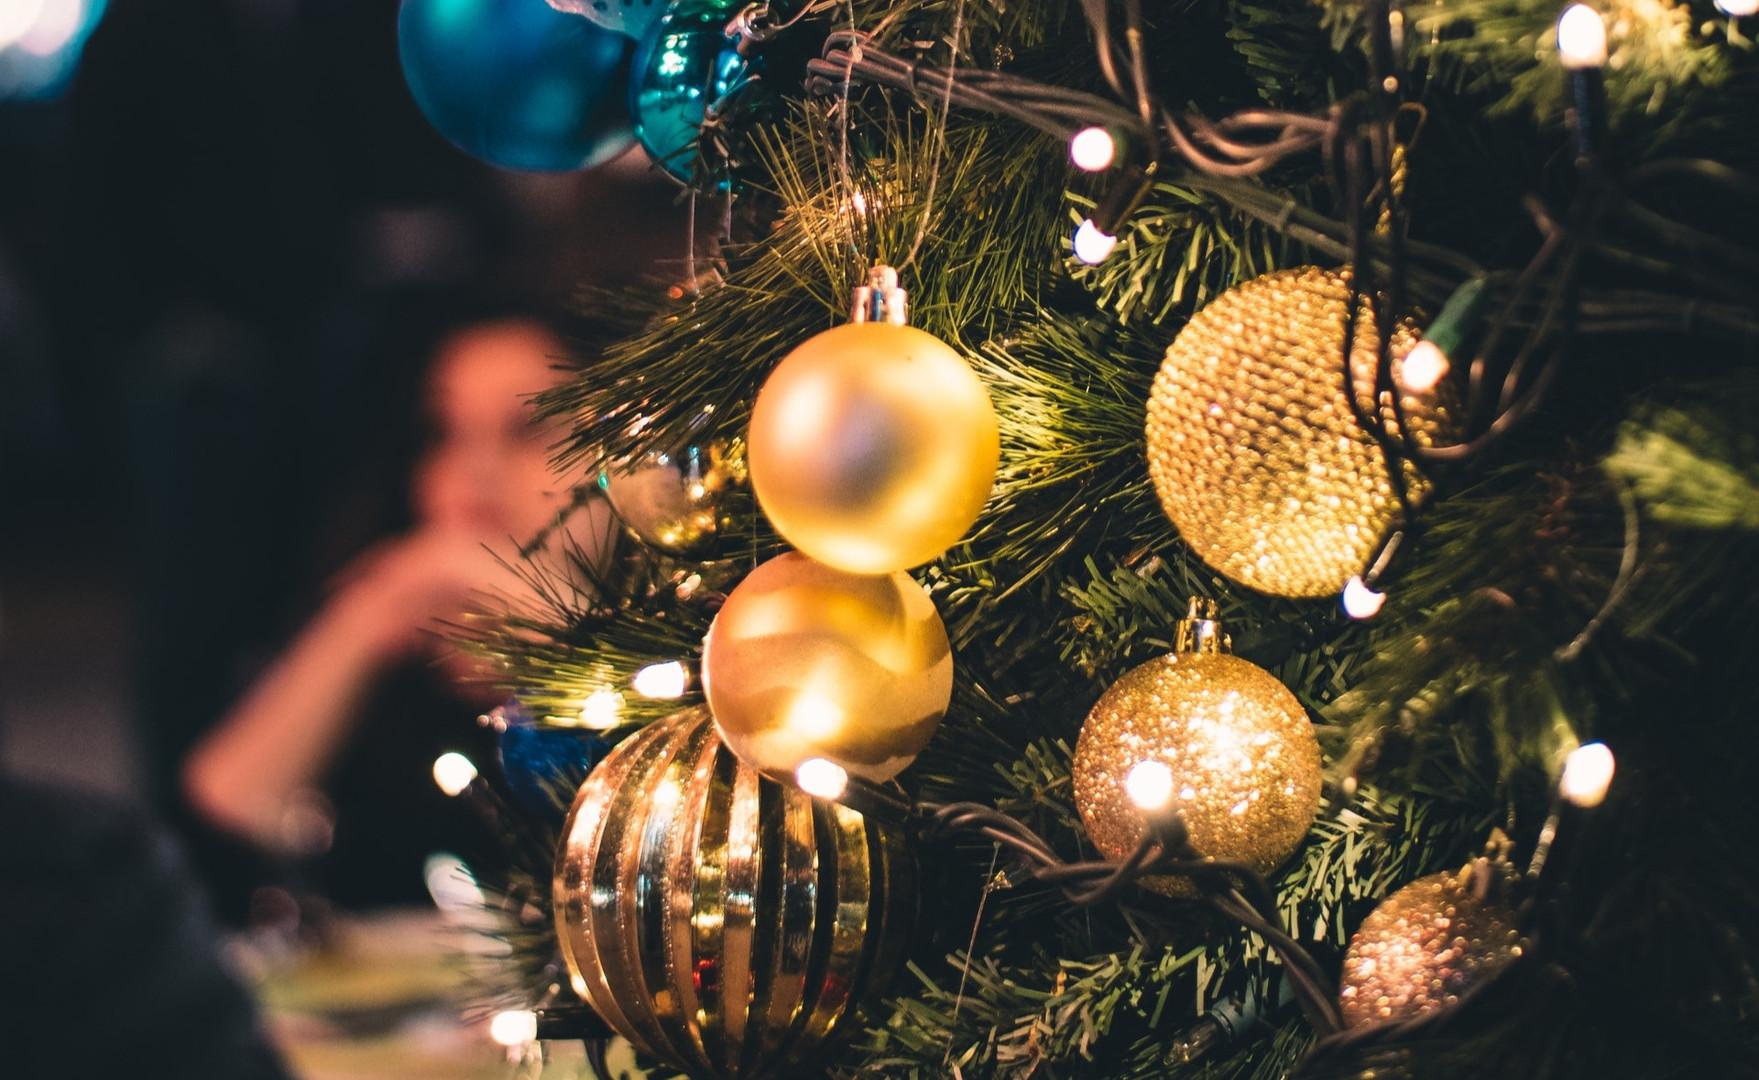 balls-blurred-background-christmas-72437